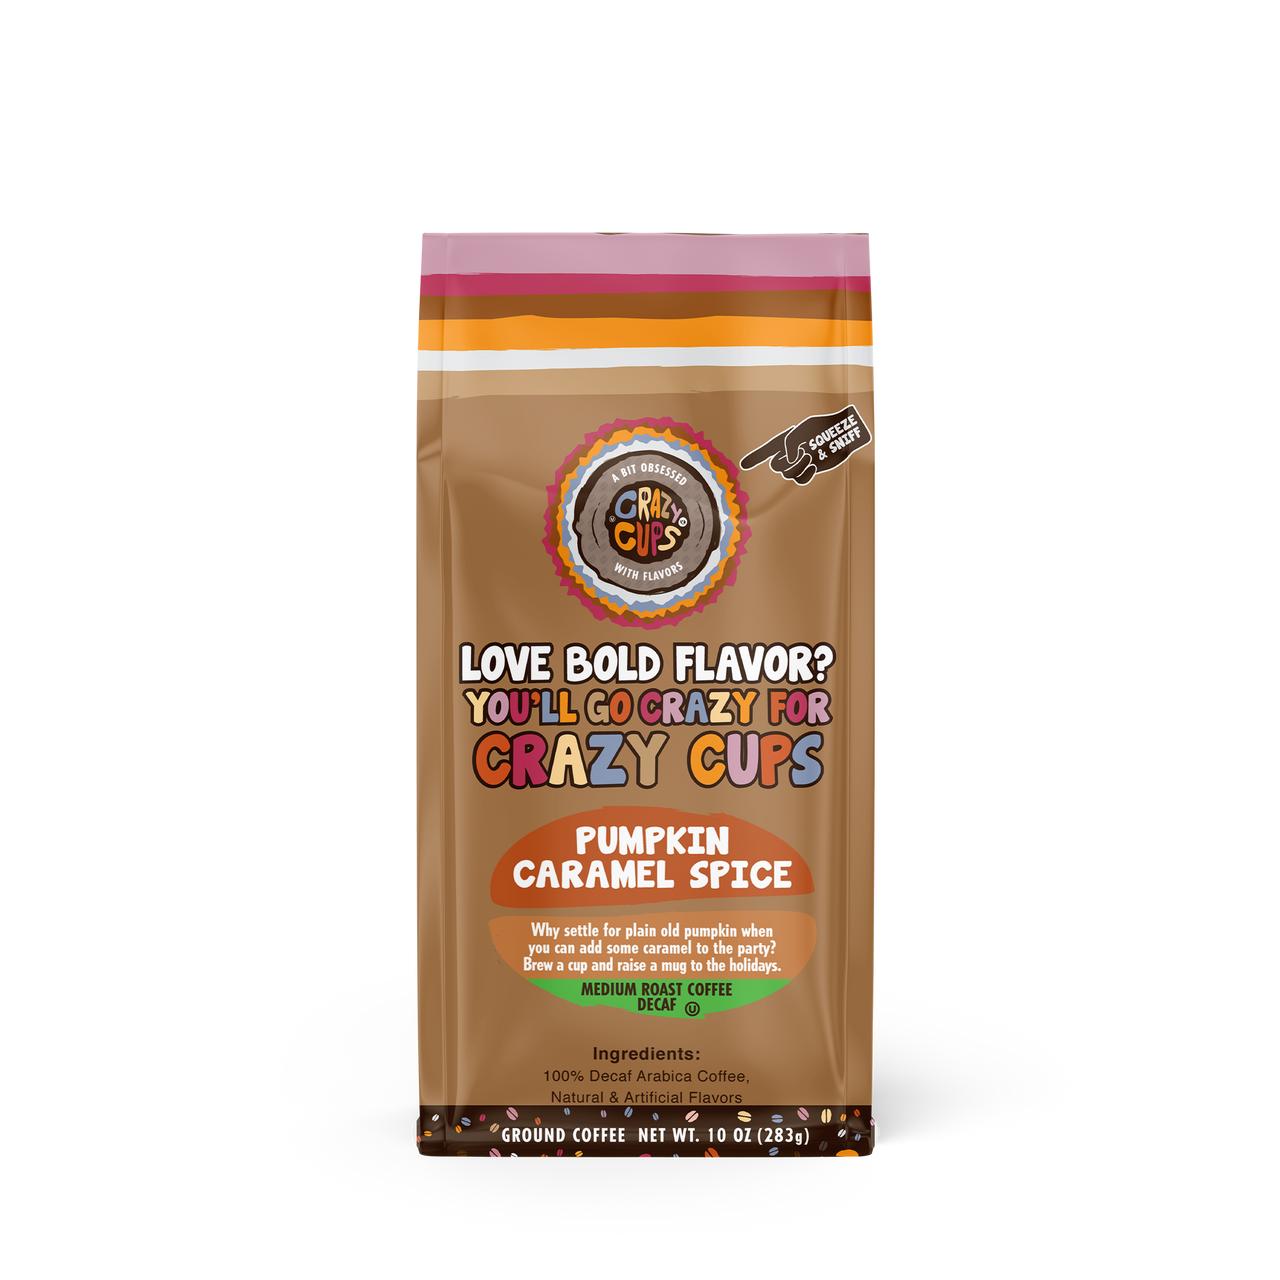 Pumpkin Caramel Decaf Ground Coffee By Crazy Cups